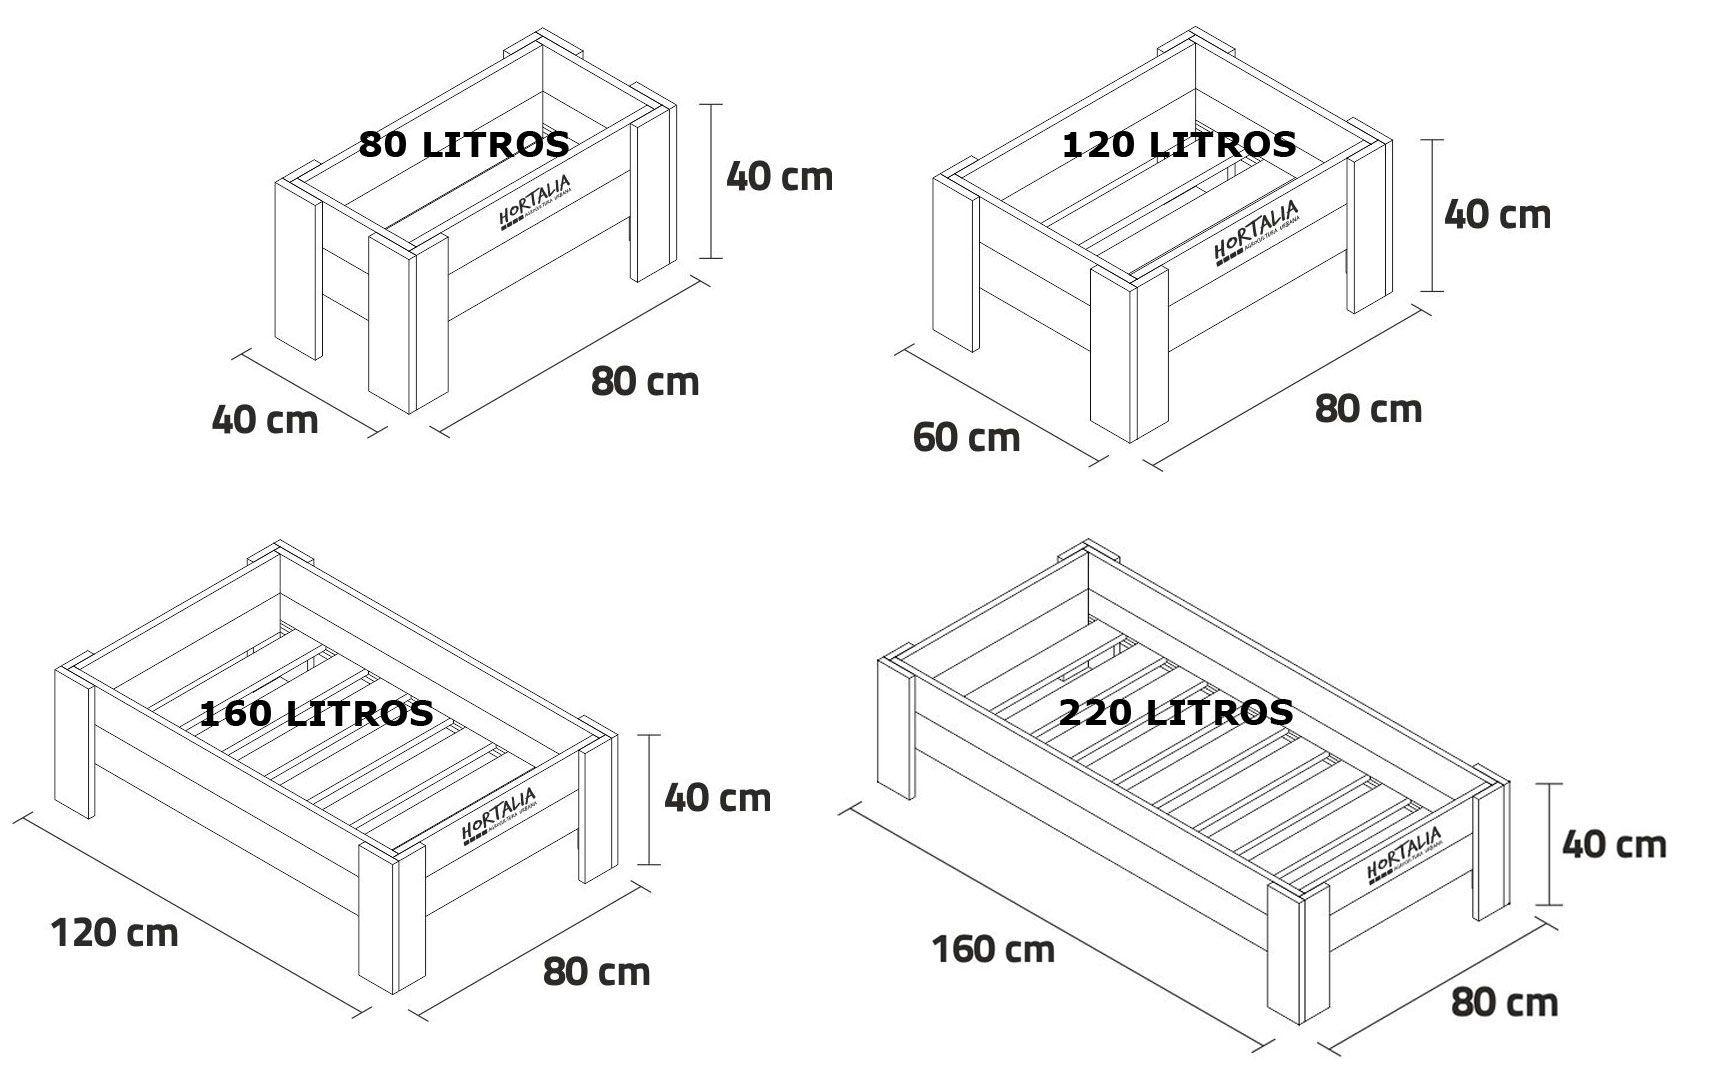 Medidas mesa de cultivo de 40 centímetros de altura